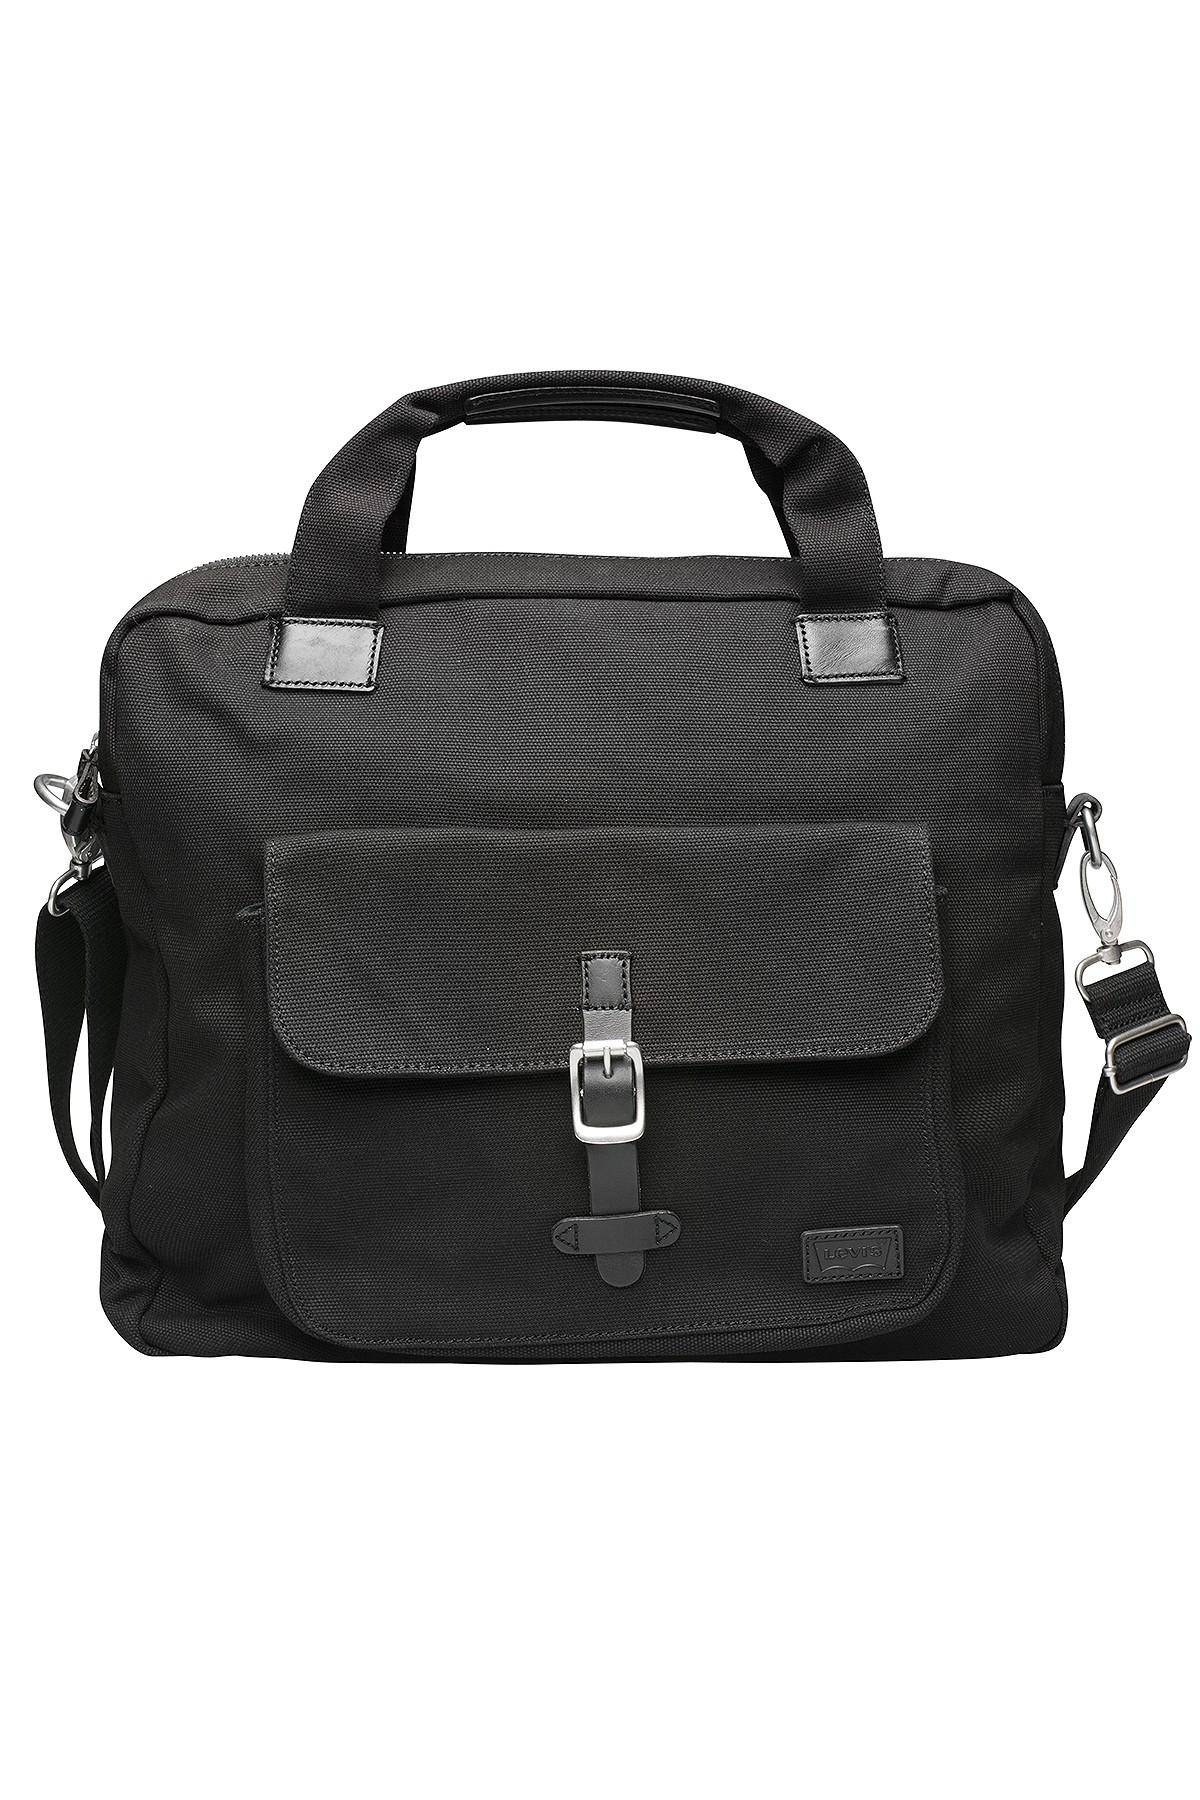 [@outlet46] Levix27s Messenger Bag Umhängetasche Schwarz 219295/23 59